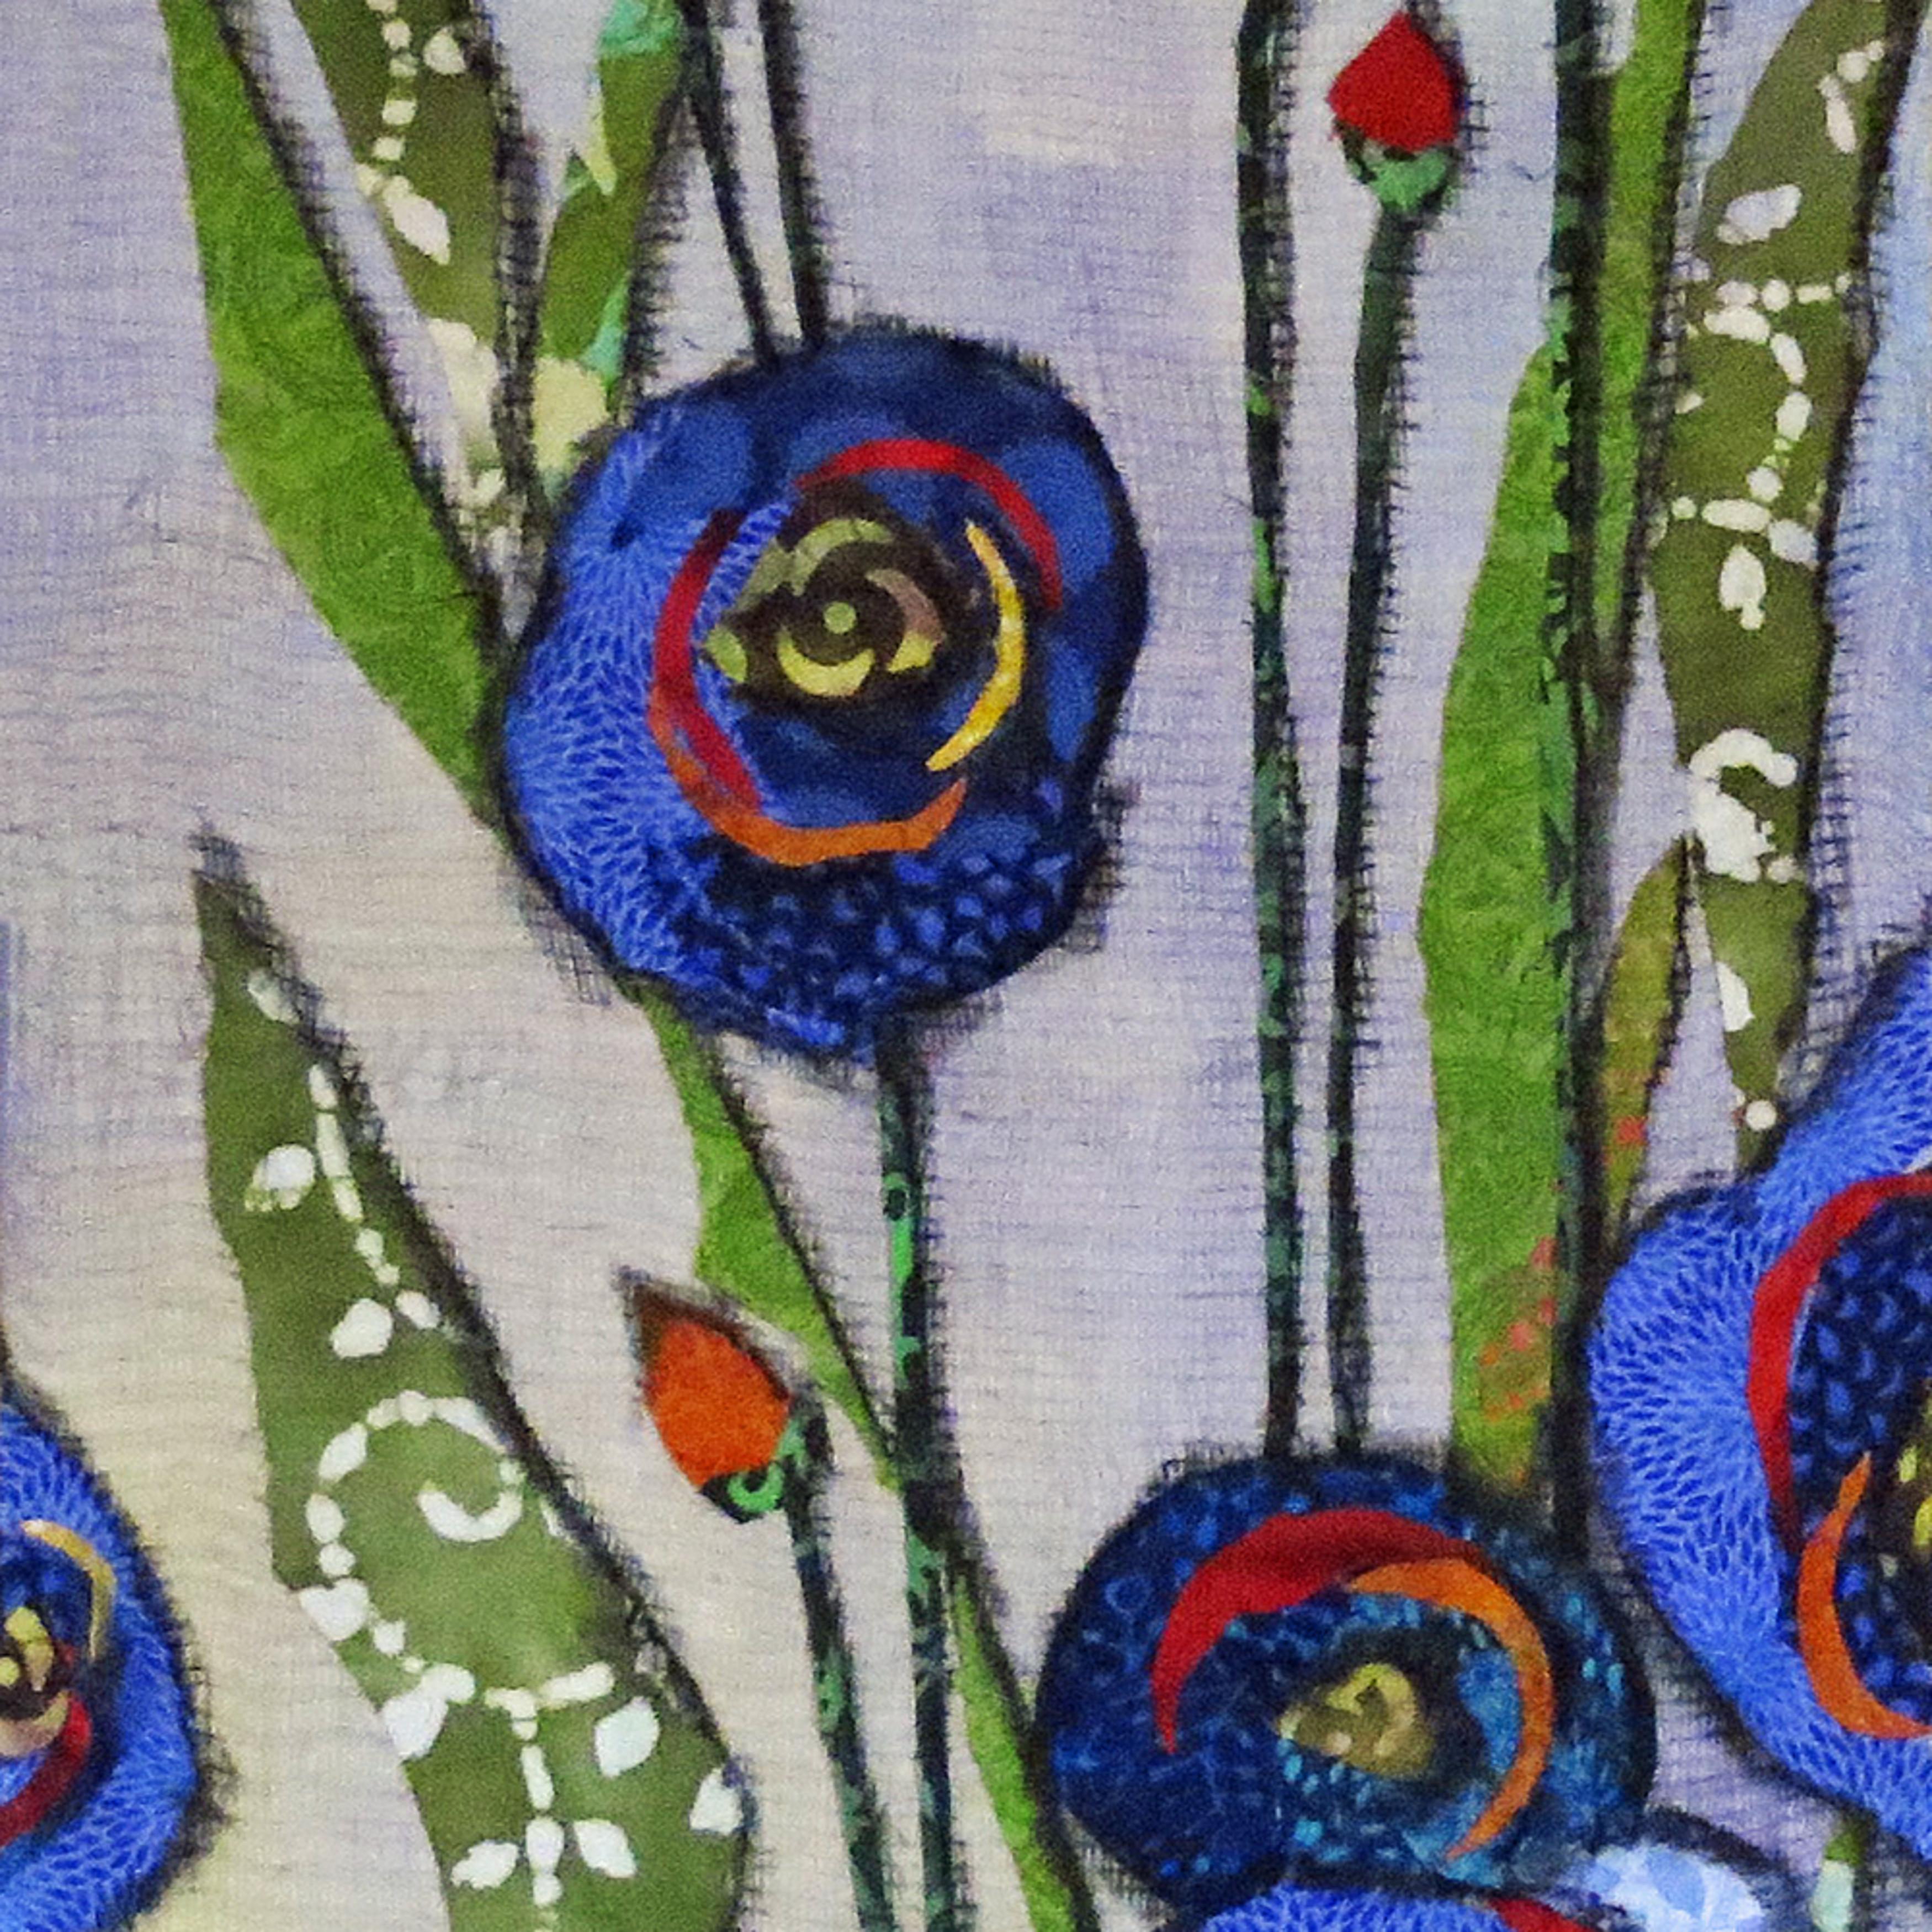 Garden blue flower asf print sbncfi